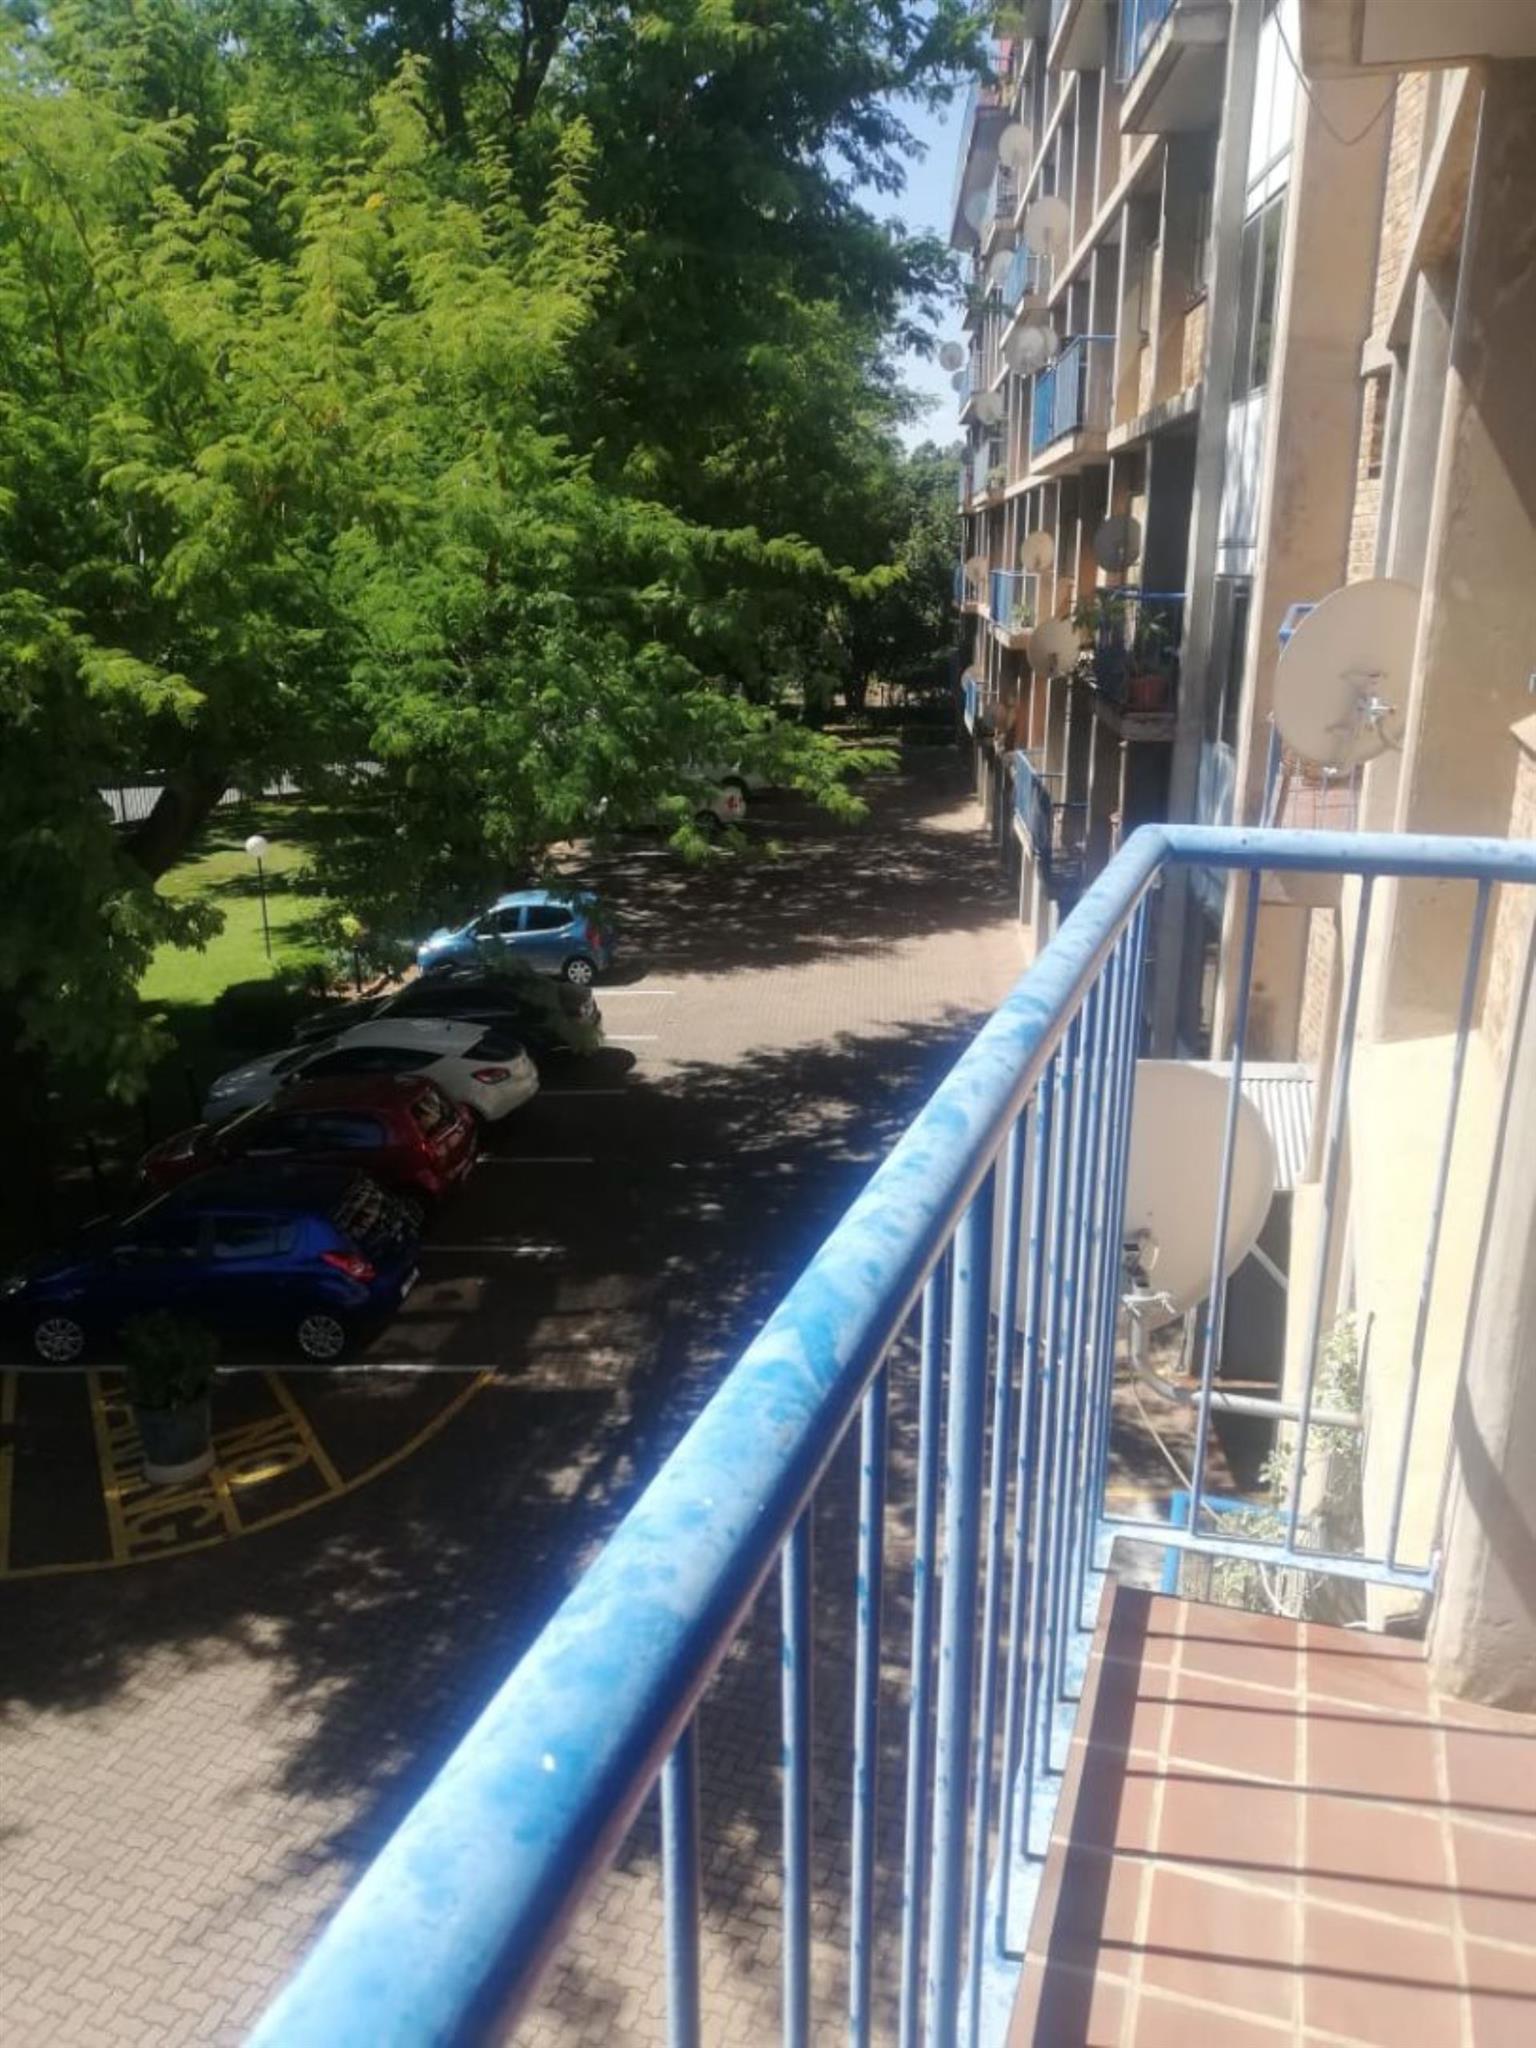 Flat Rental Monthly in KILNER PARK